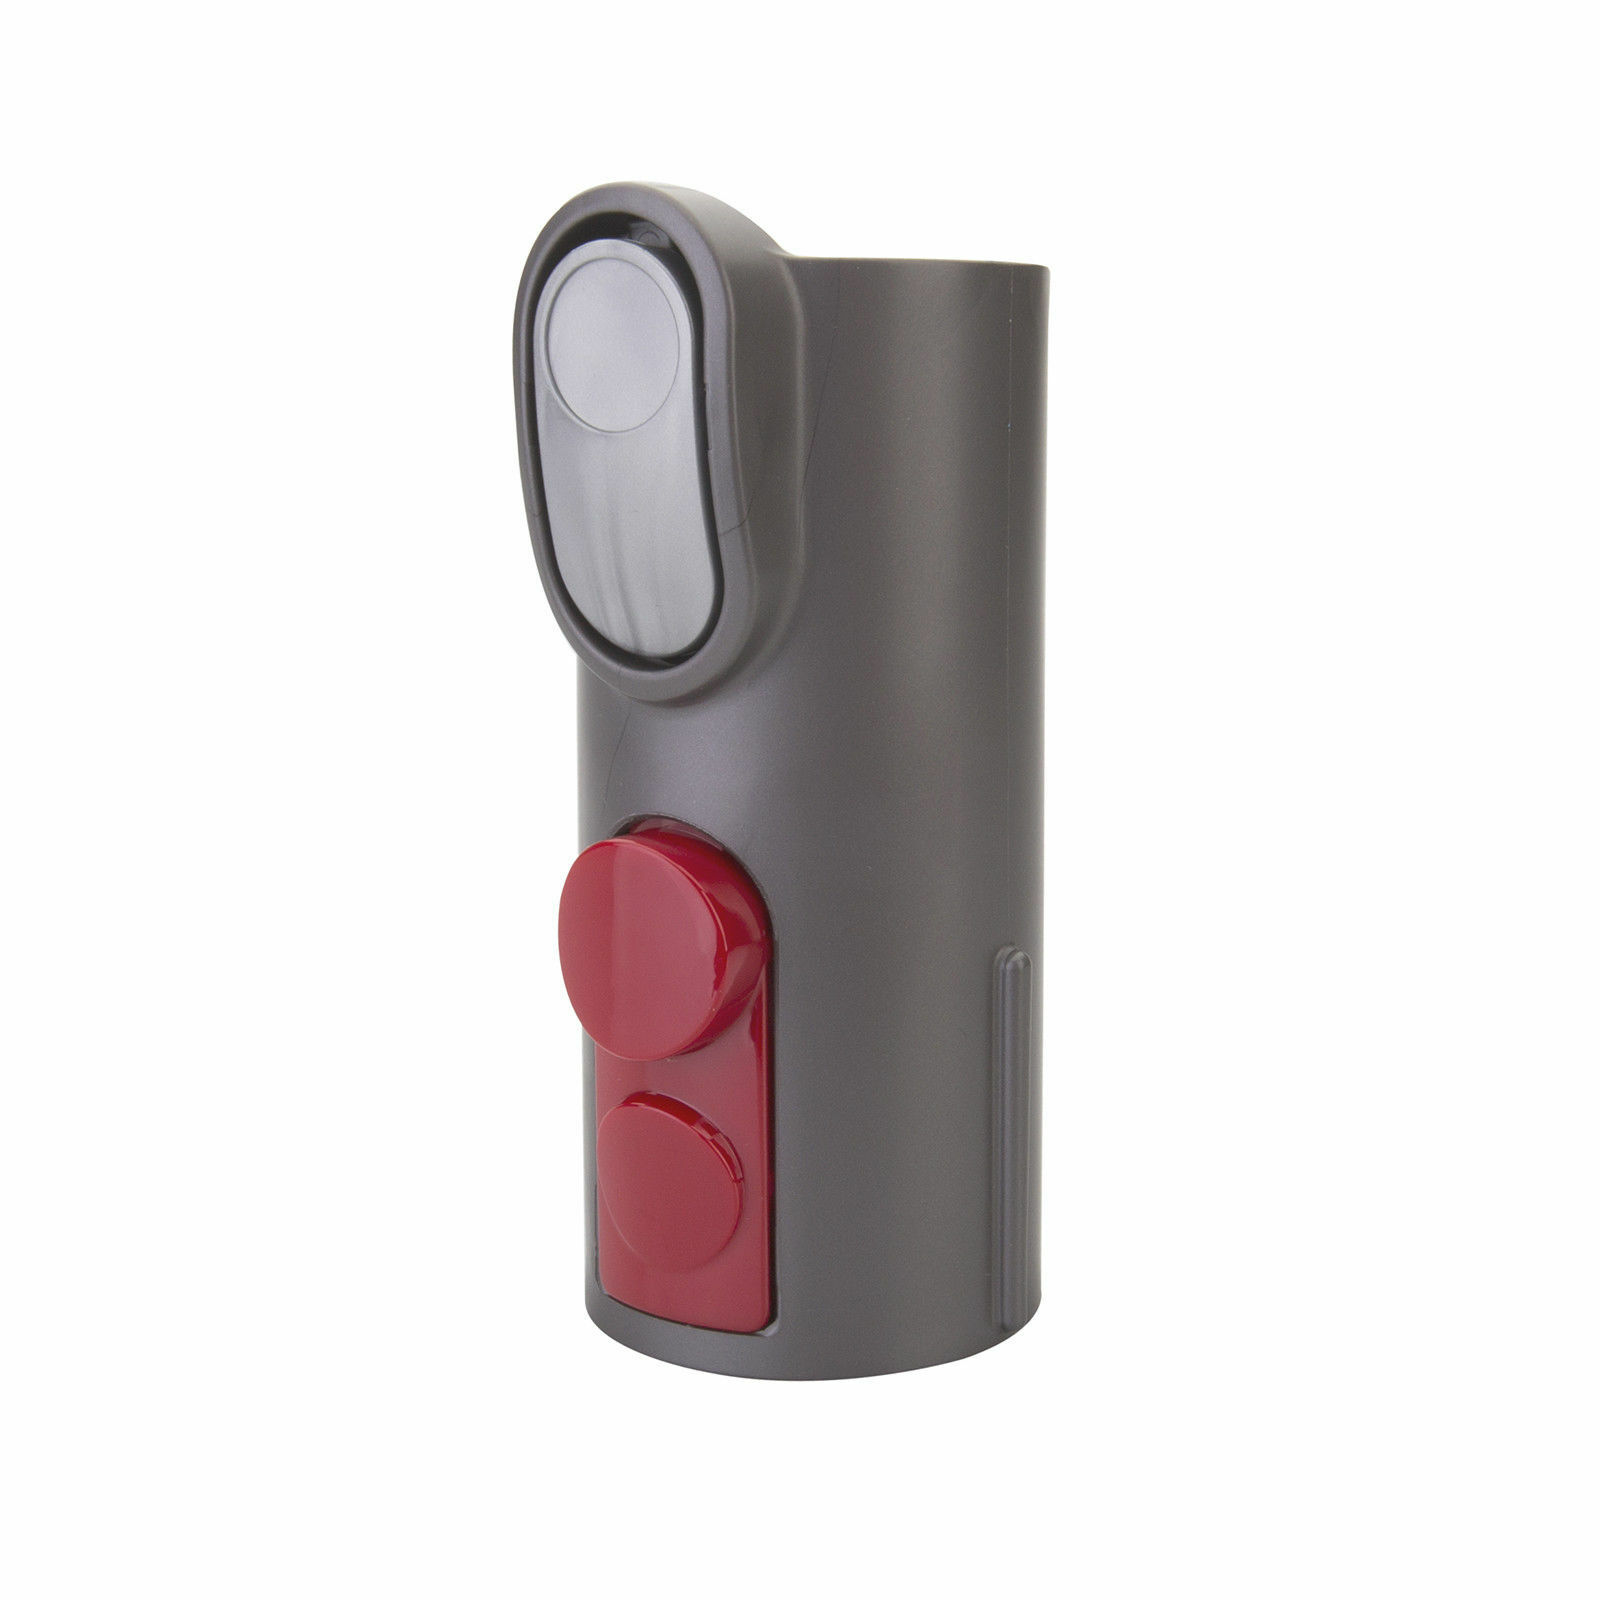 Адаптер для пылесоса dyson зарядное устройство для dyson v6